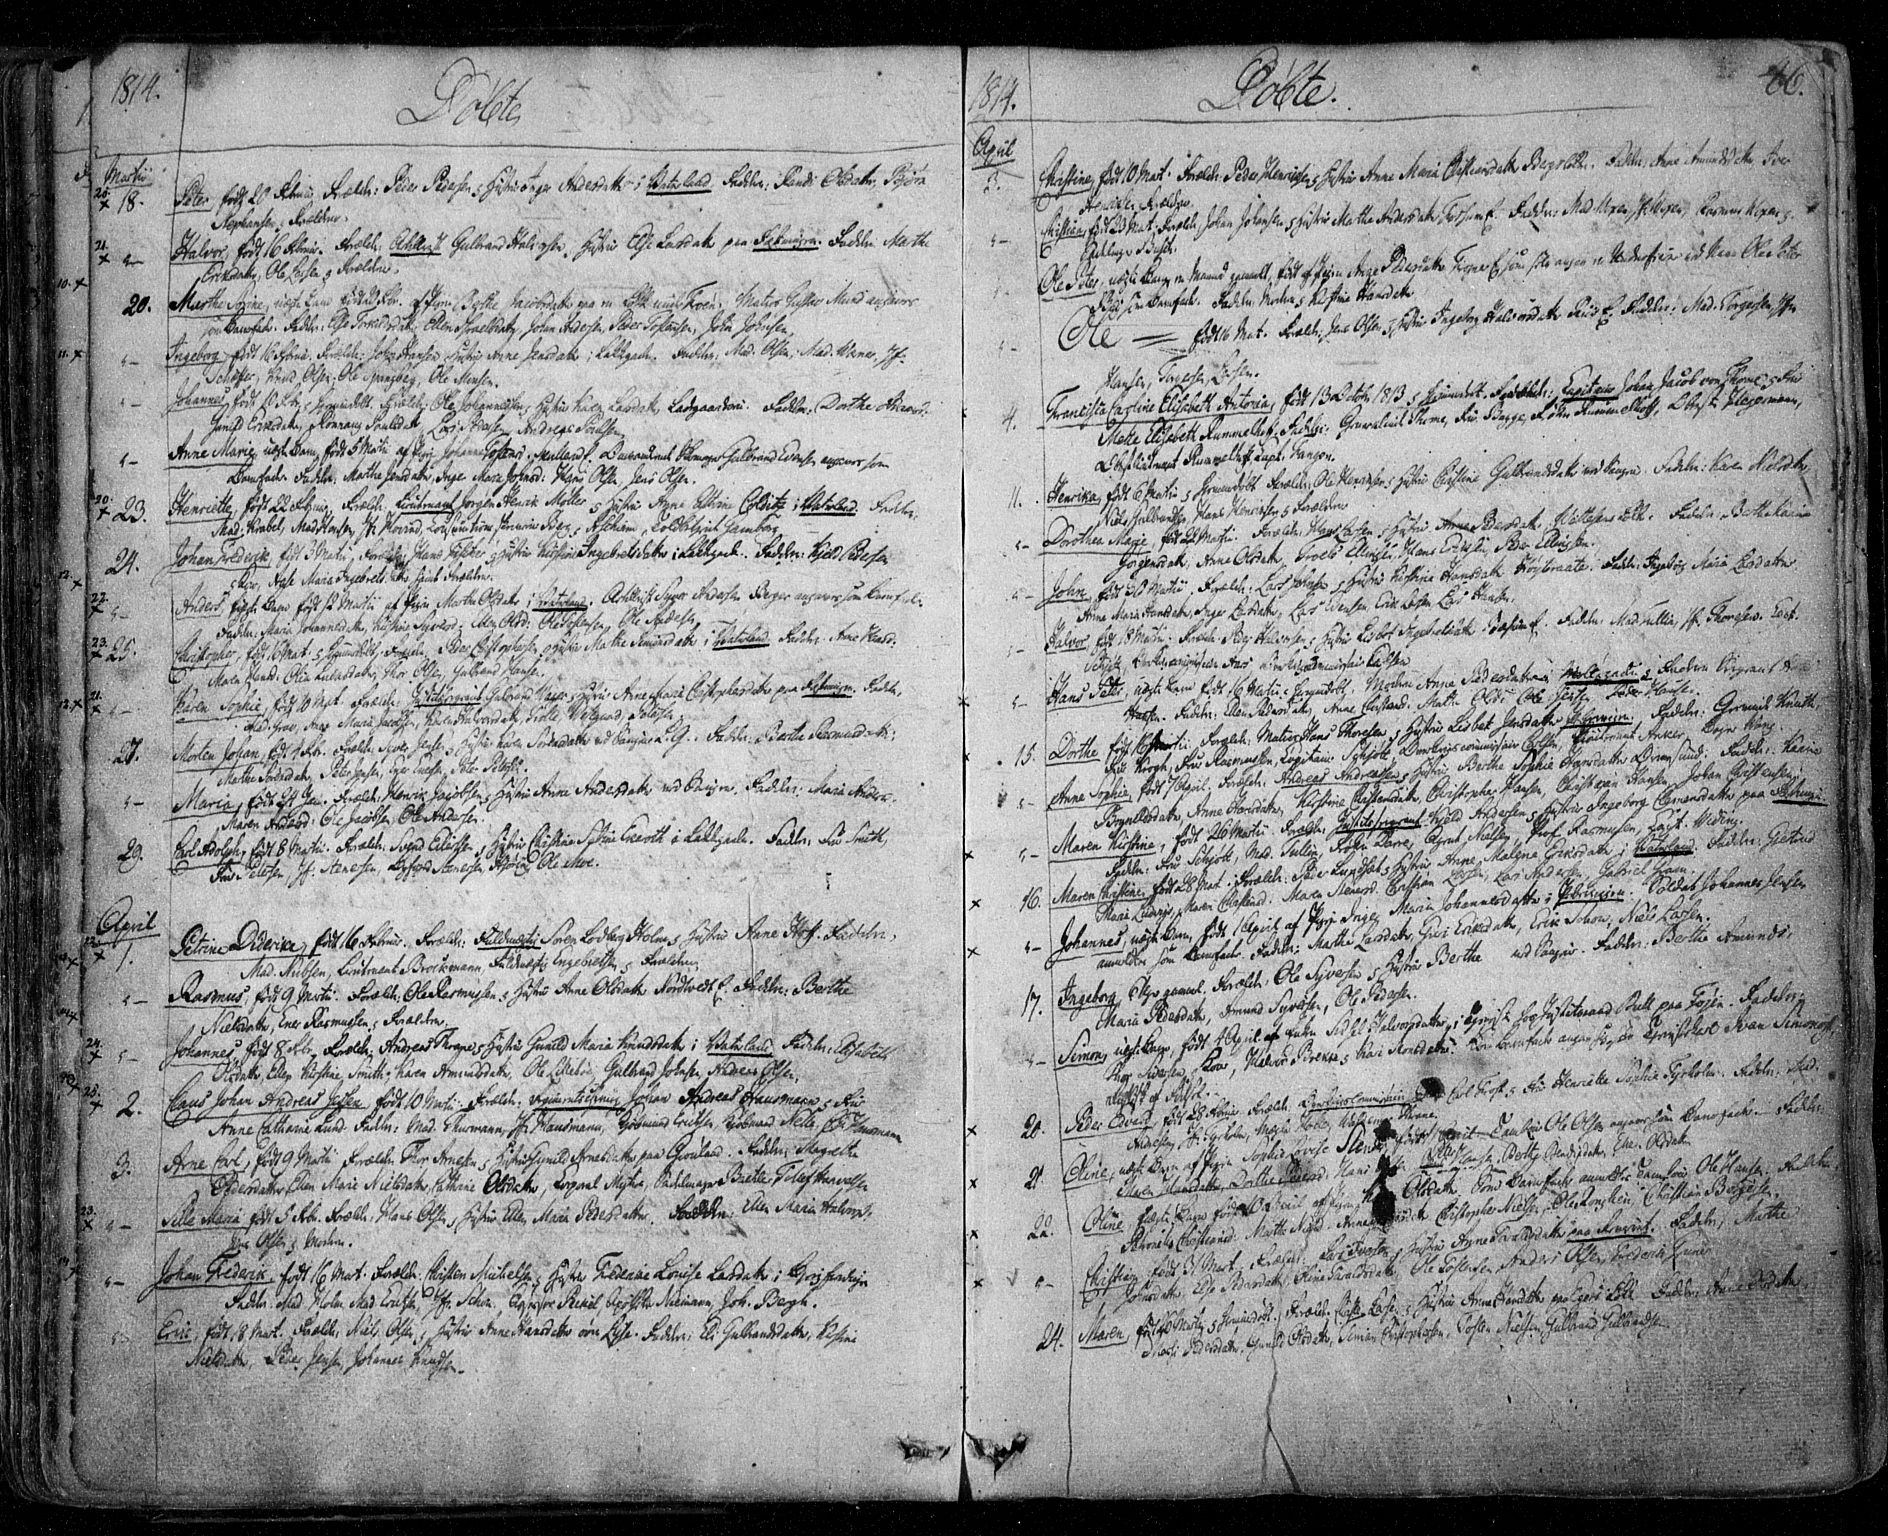 SAO, Aker prestekontor kirkebøker, F/L0011: Parish register (official) no. 11, 1810-1819, p. 46